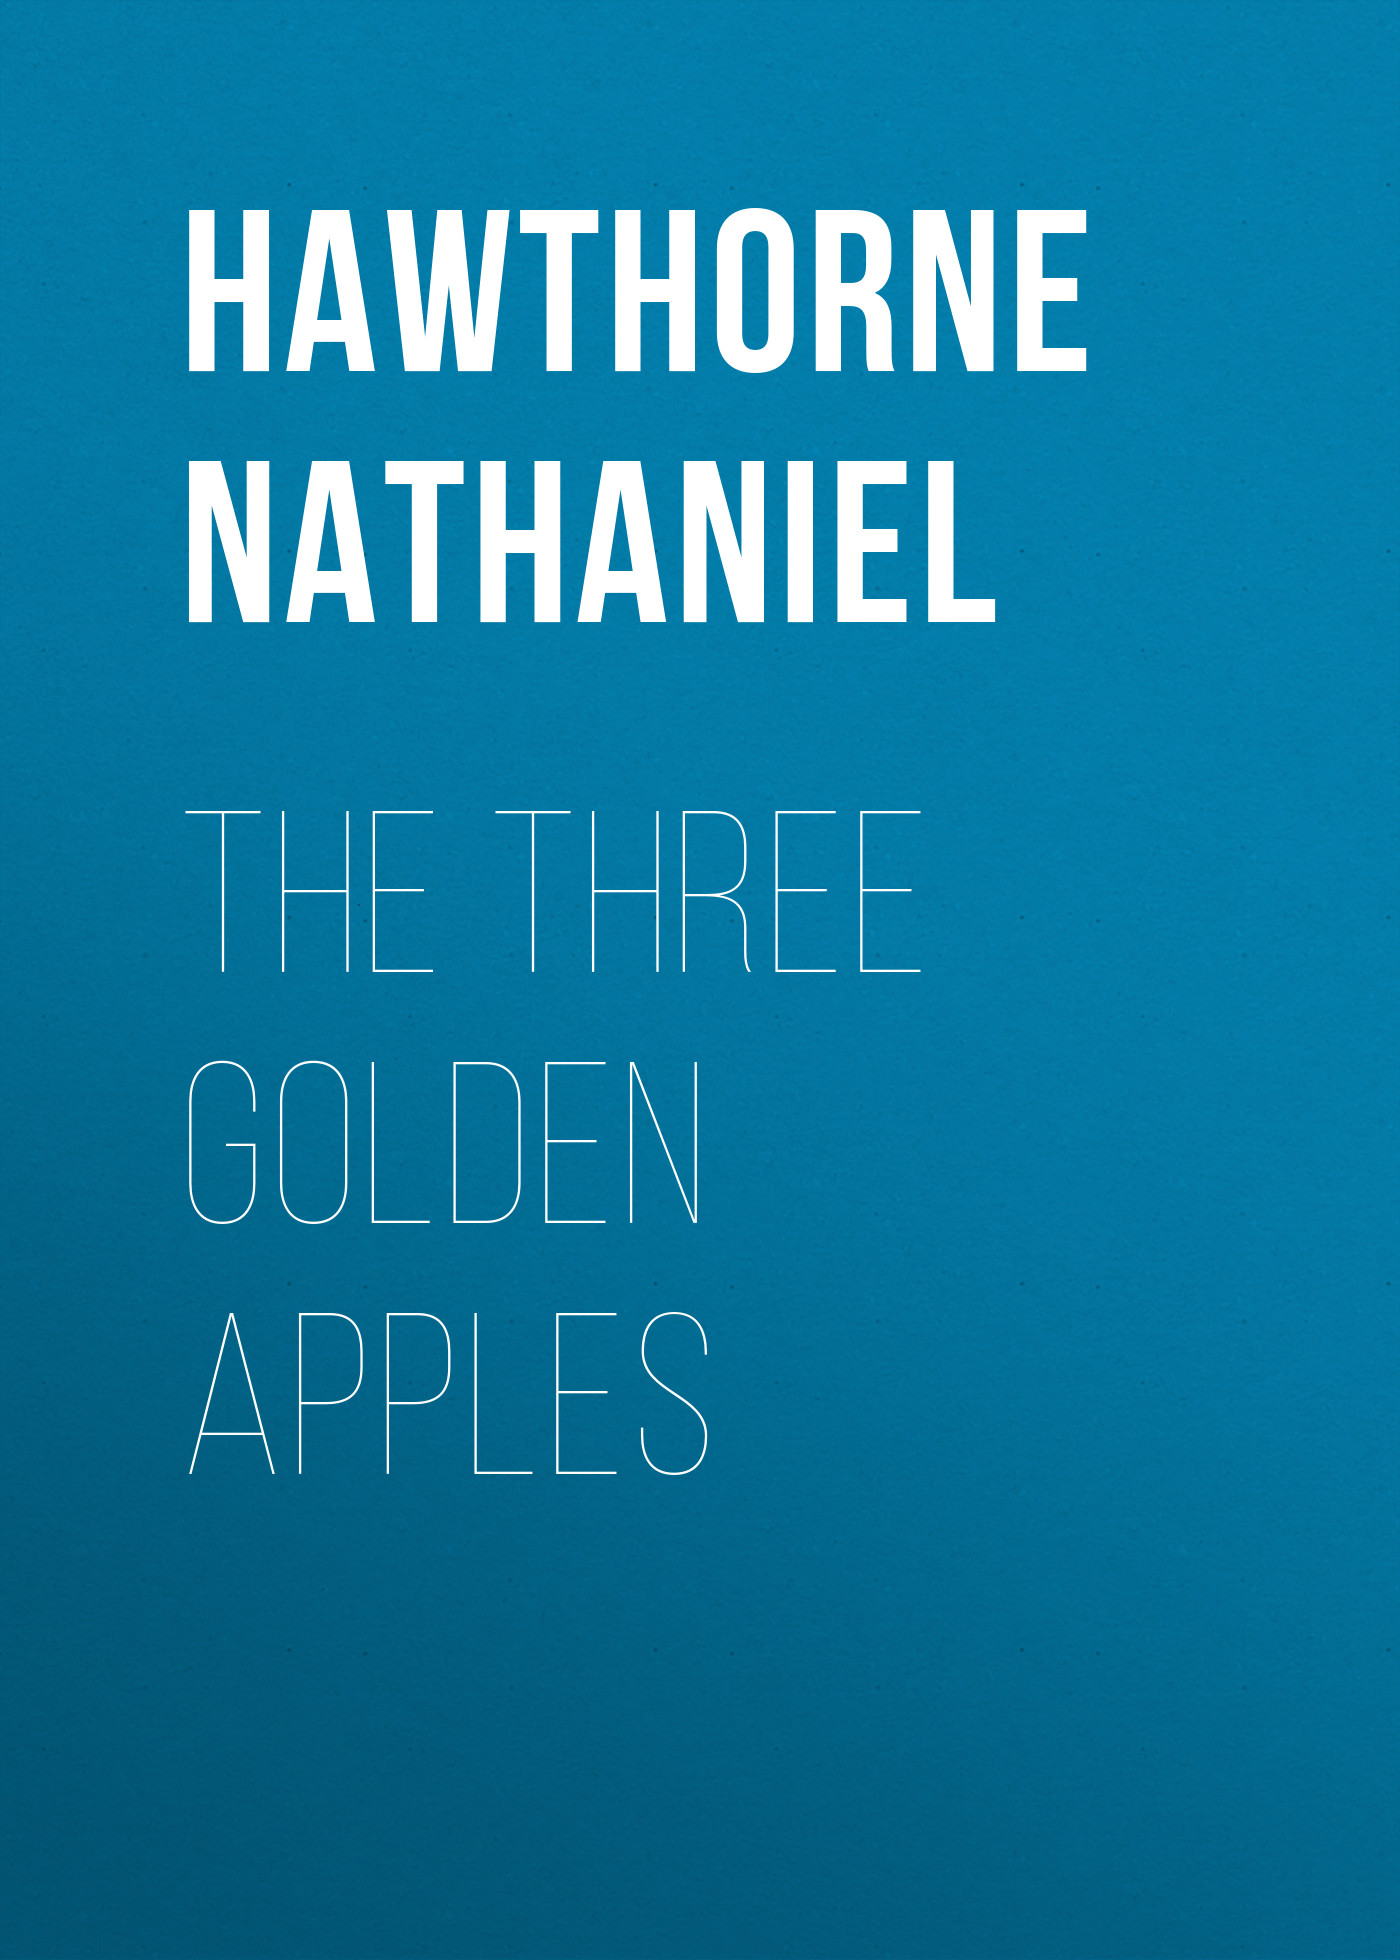 Hawthorne Nathaniel The Three Golden Apples рэй брэдбери golden apples of the sun